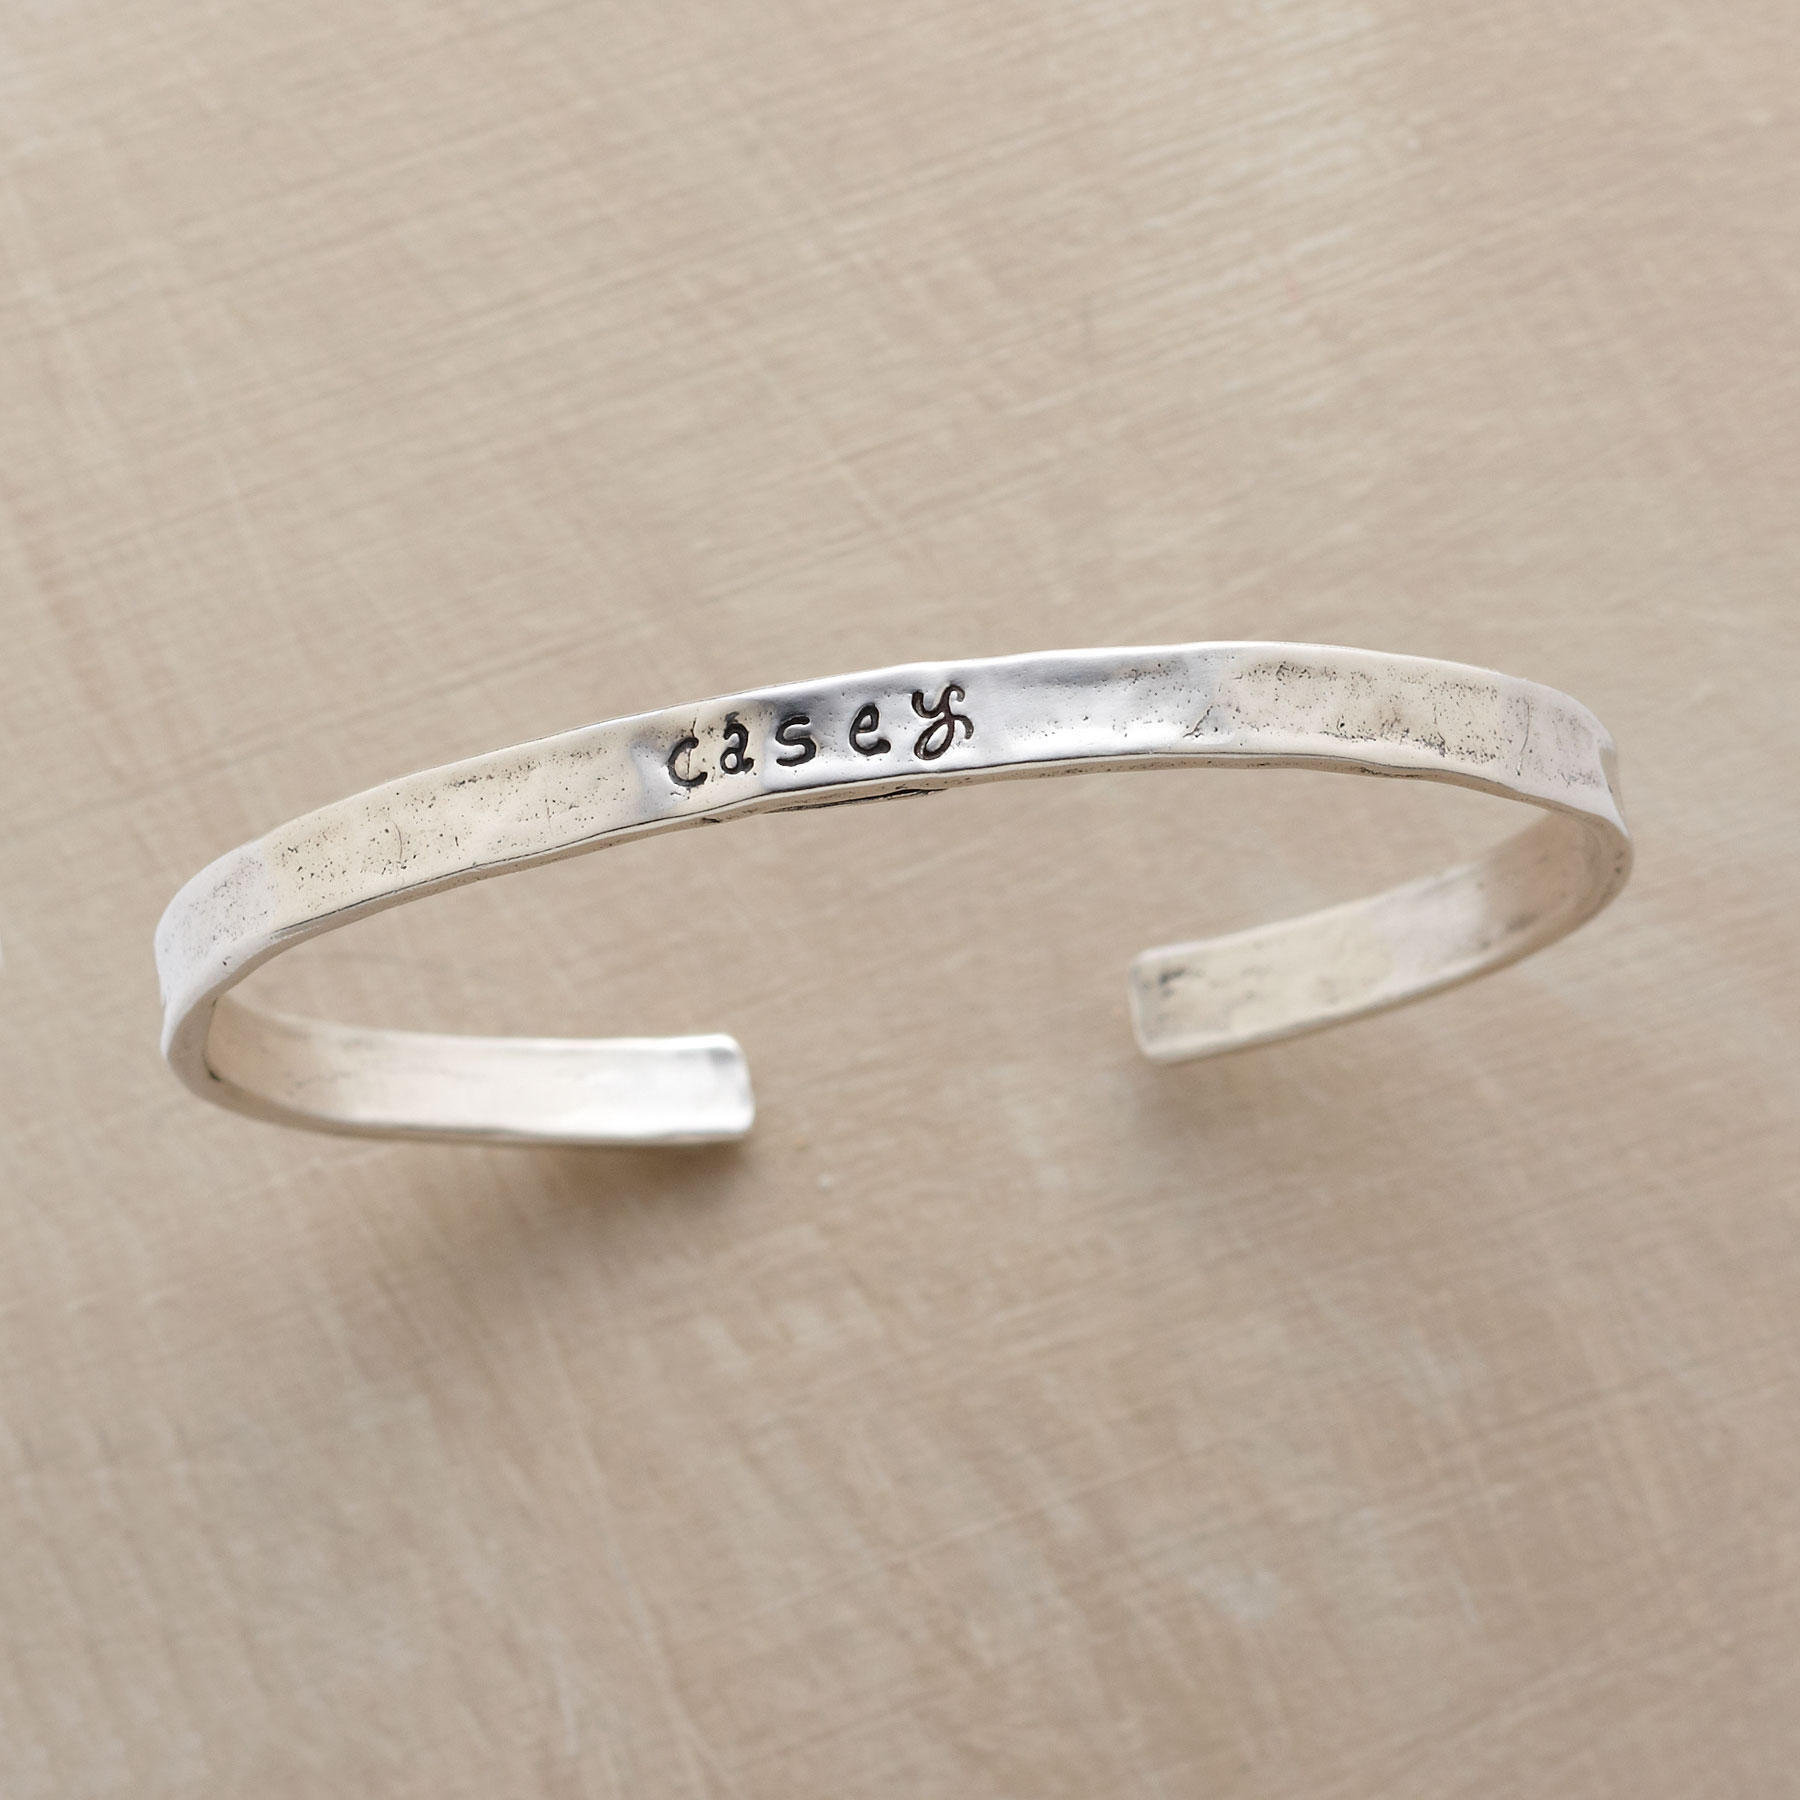 Personalized Wind Cuff Bracelet